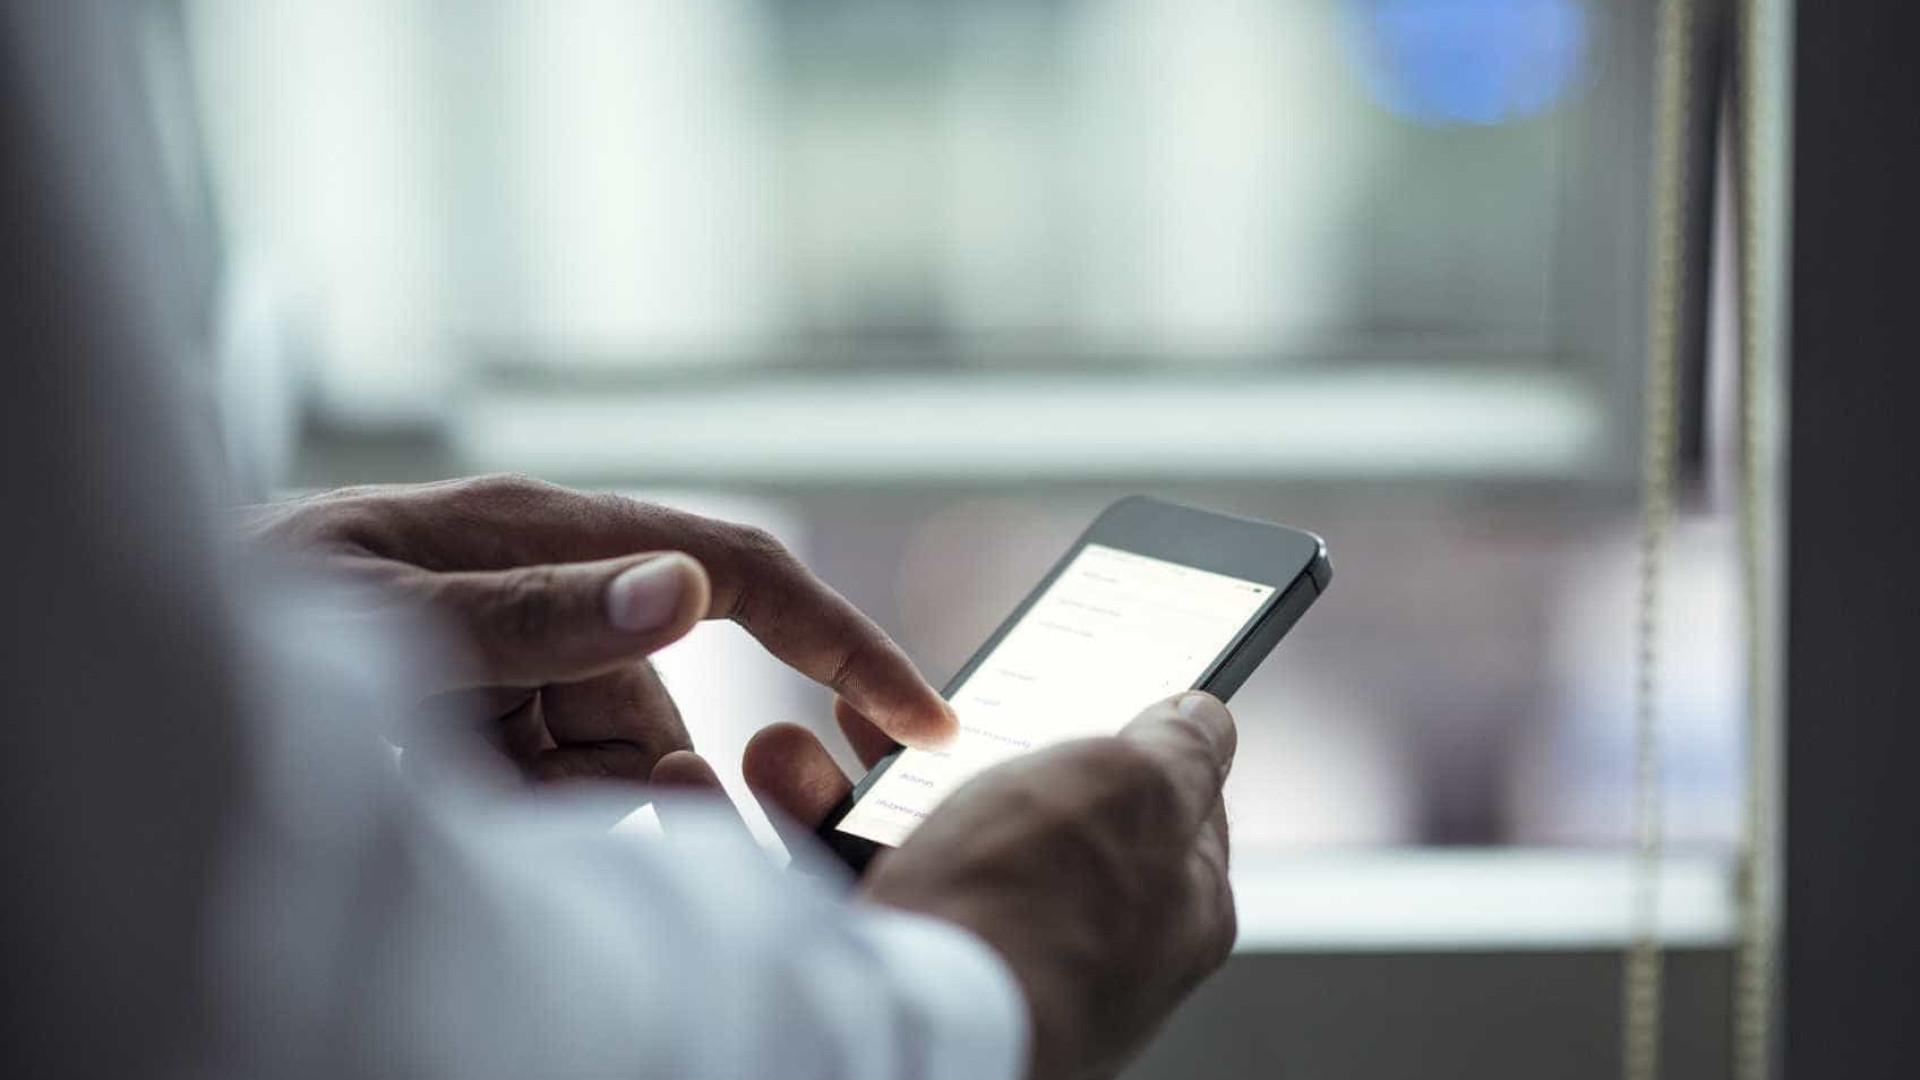 Mundial2018: Telemóveis e computadores na mira de ciberespiões